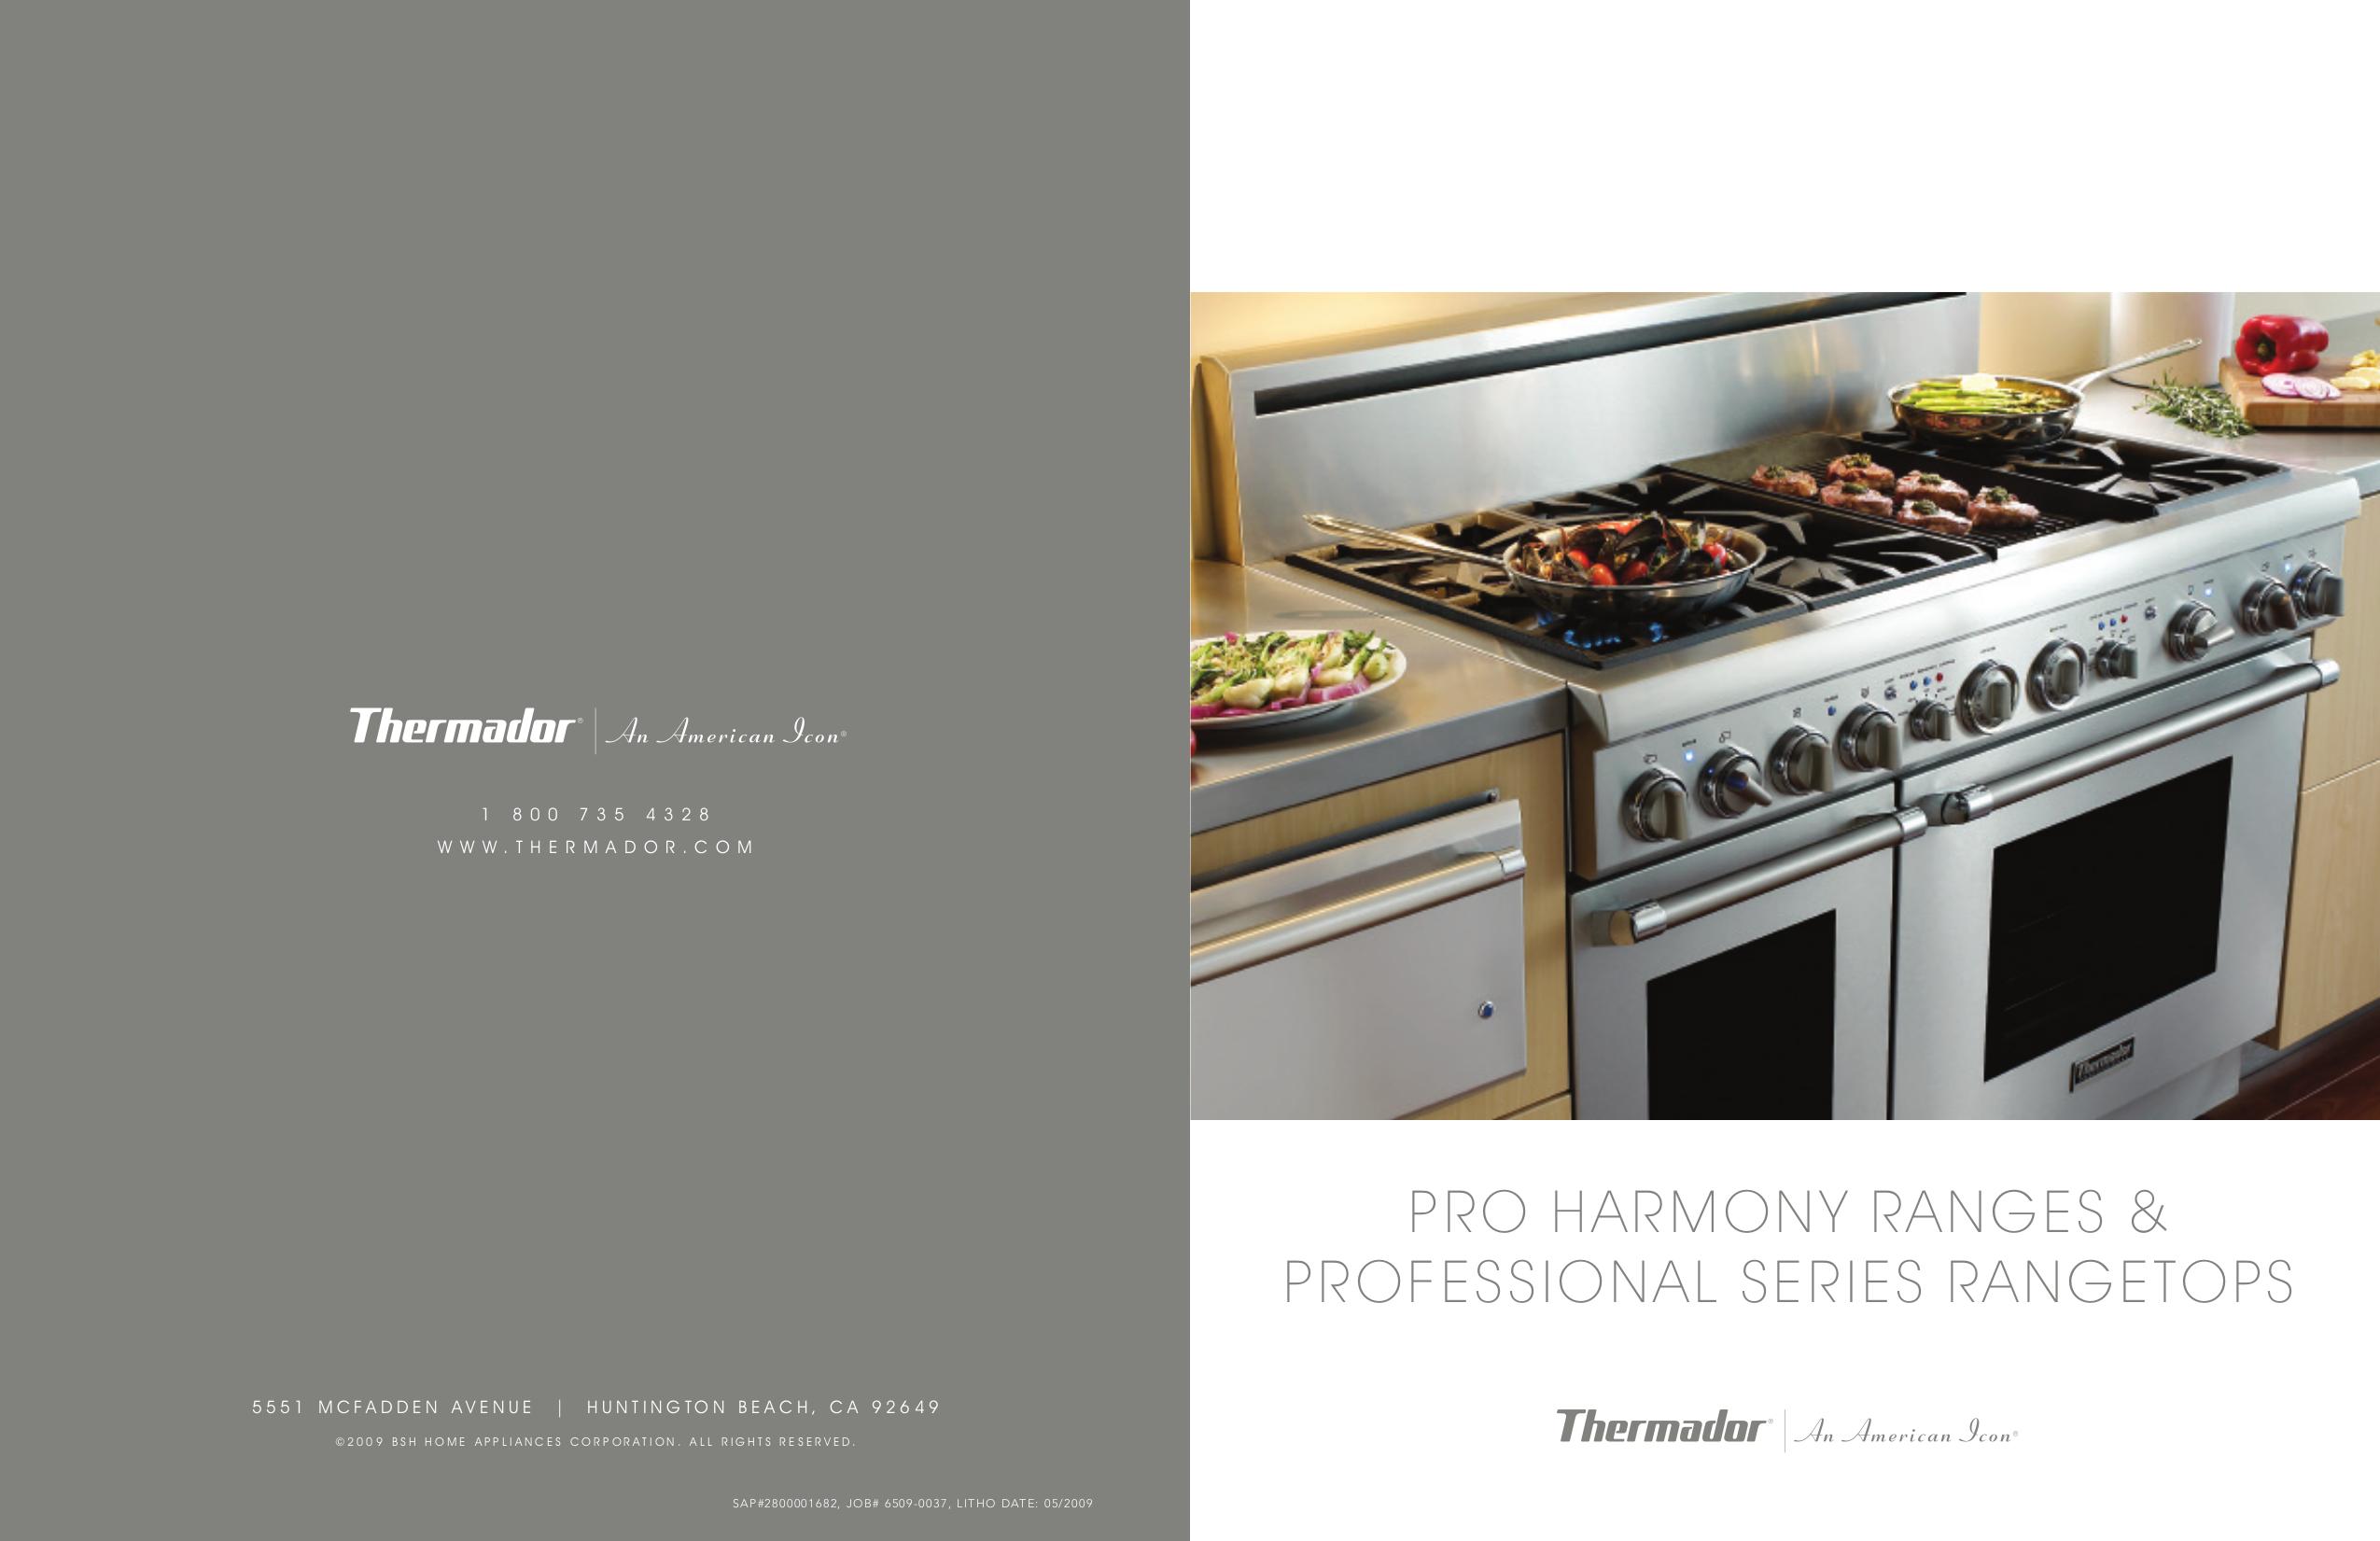 Download free pdf for thermador prl486edg range manual.